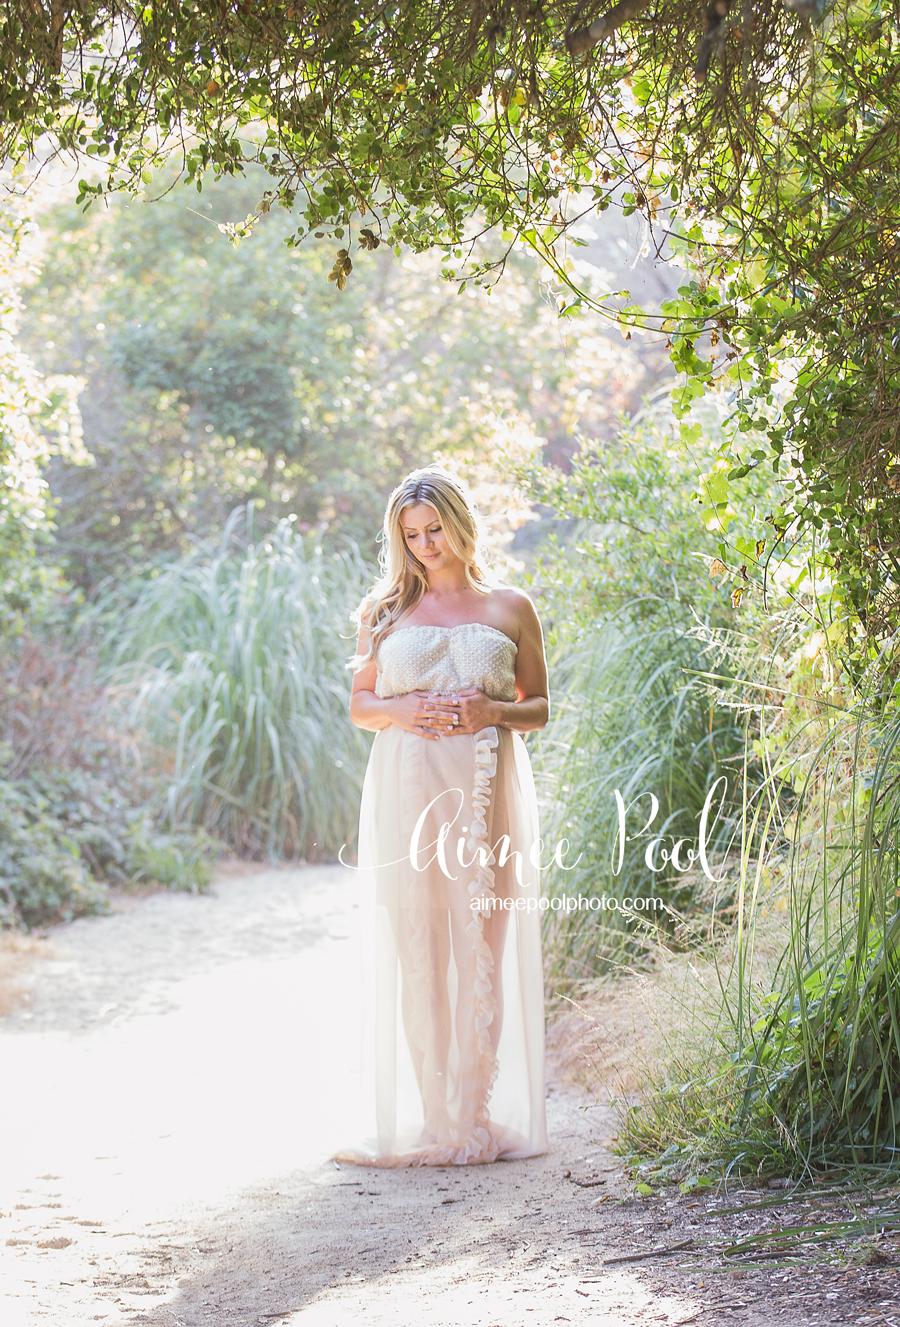 Santa Cruz Pregnancy Photographer - Maternity Beach Session